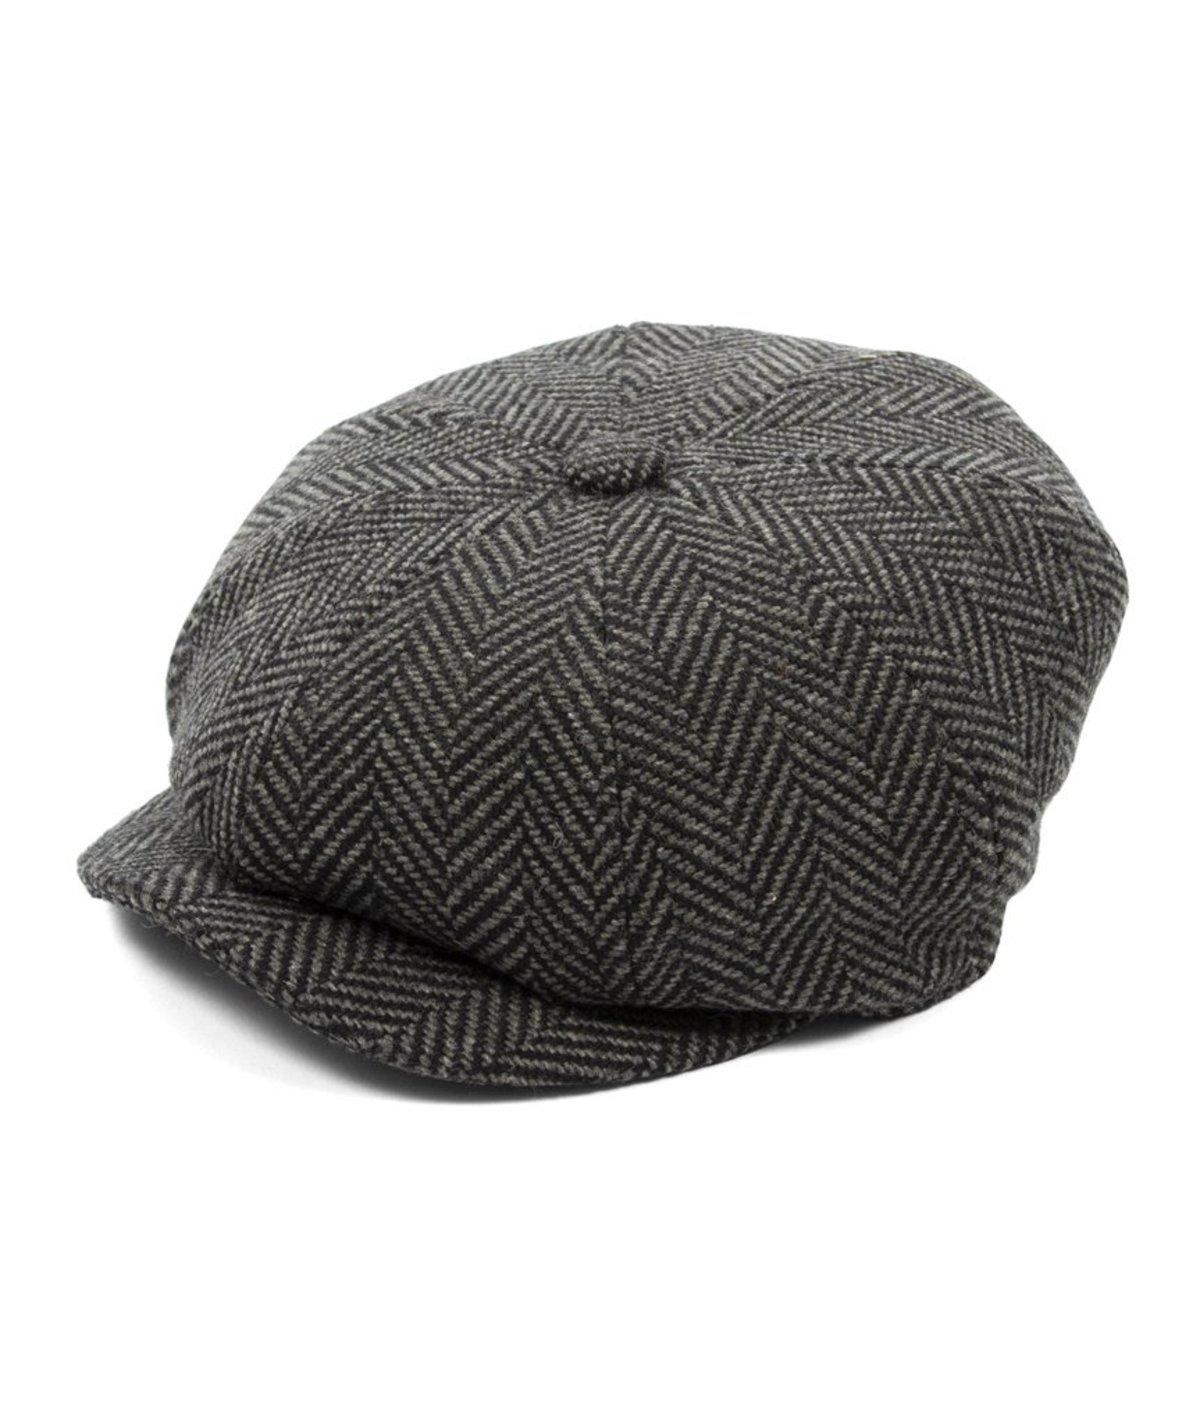 Barbour Baker Boy Cap - Mixed Tweed  f1bc4ae6f27